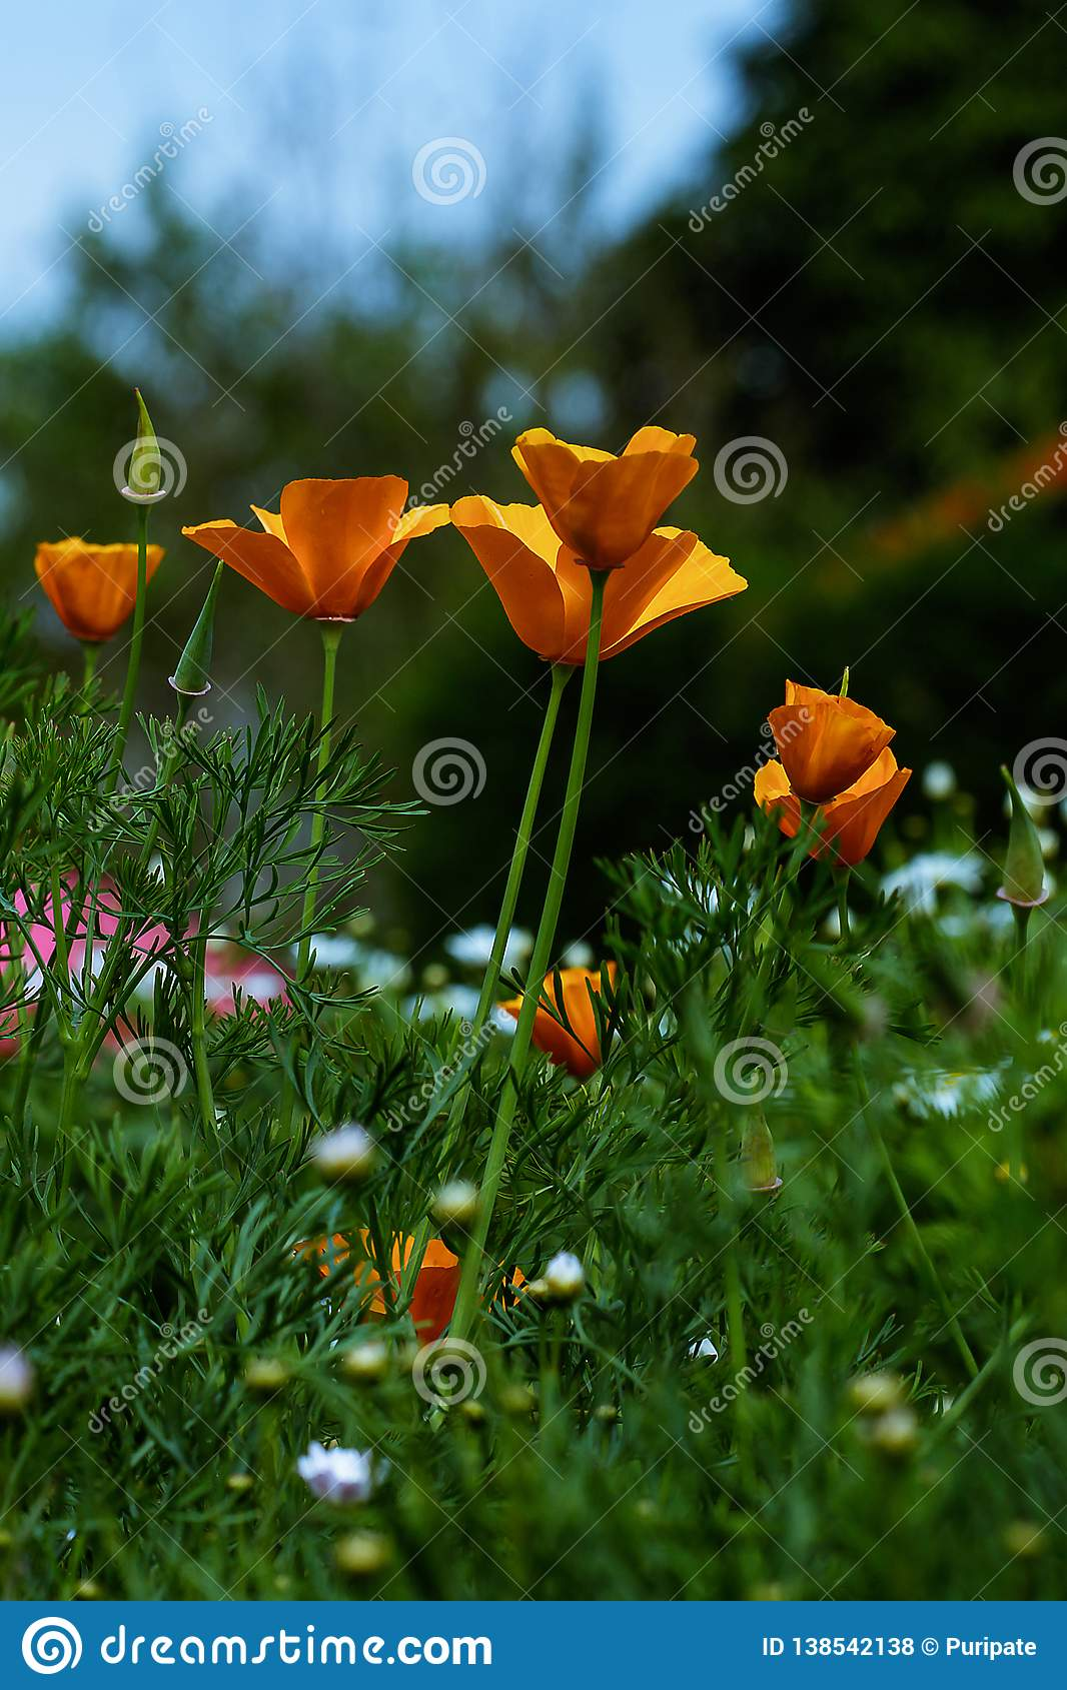 Papaveraceae in the garden is blooming